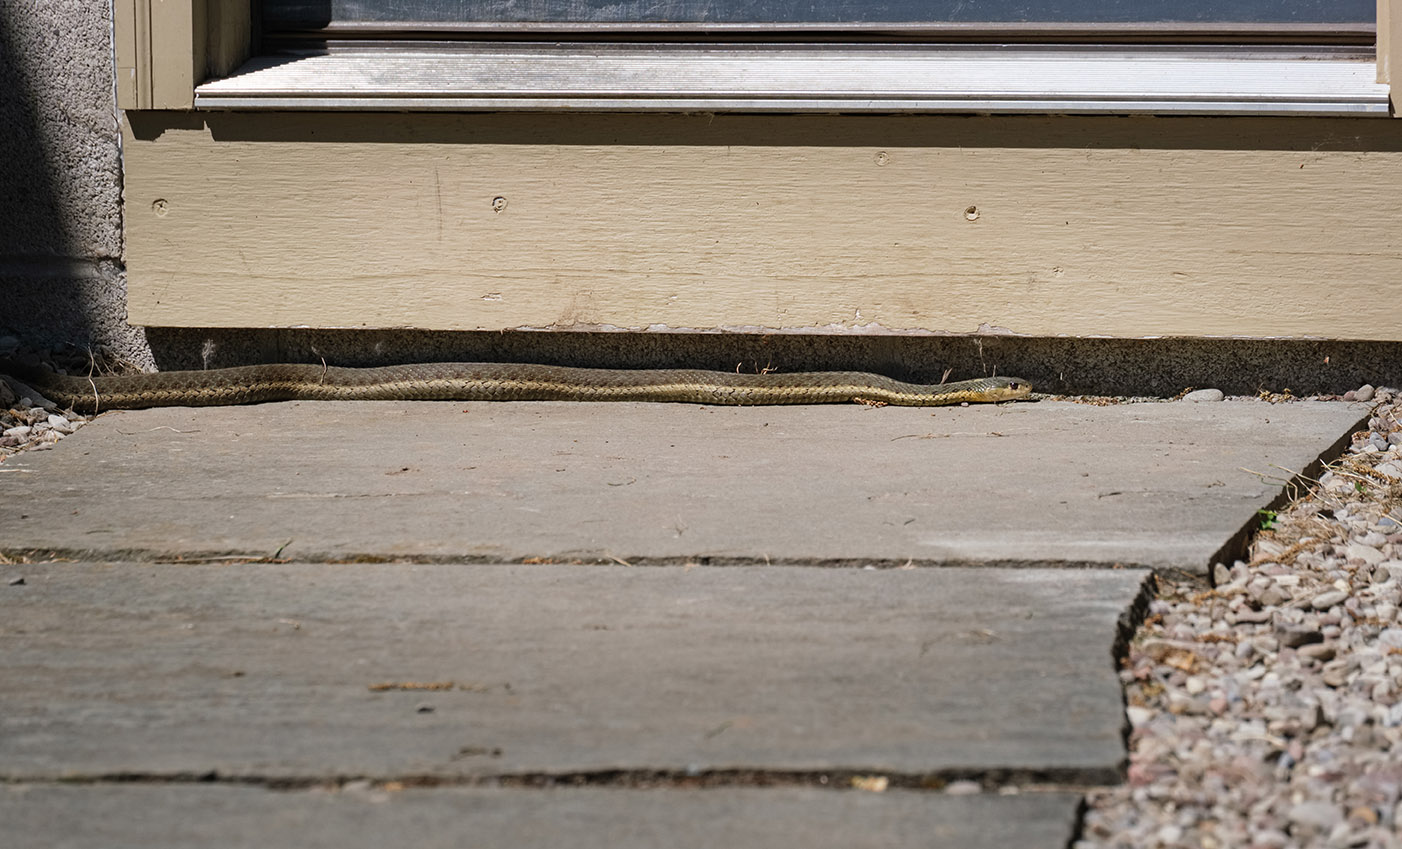 6752 - Snake moving under door - lr